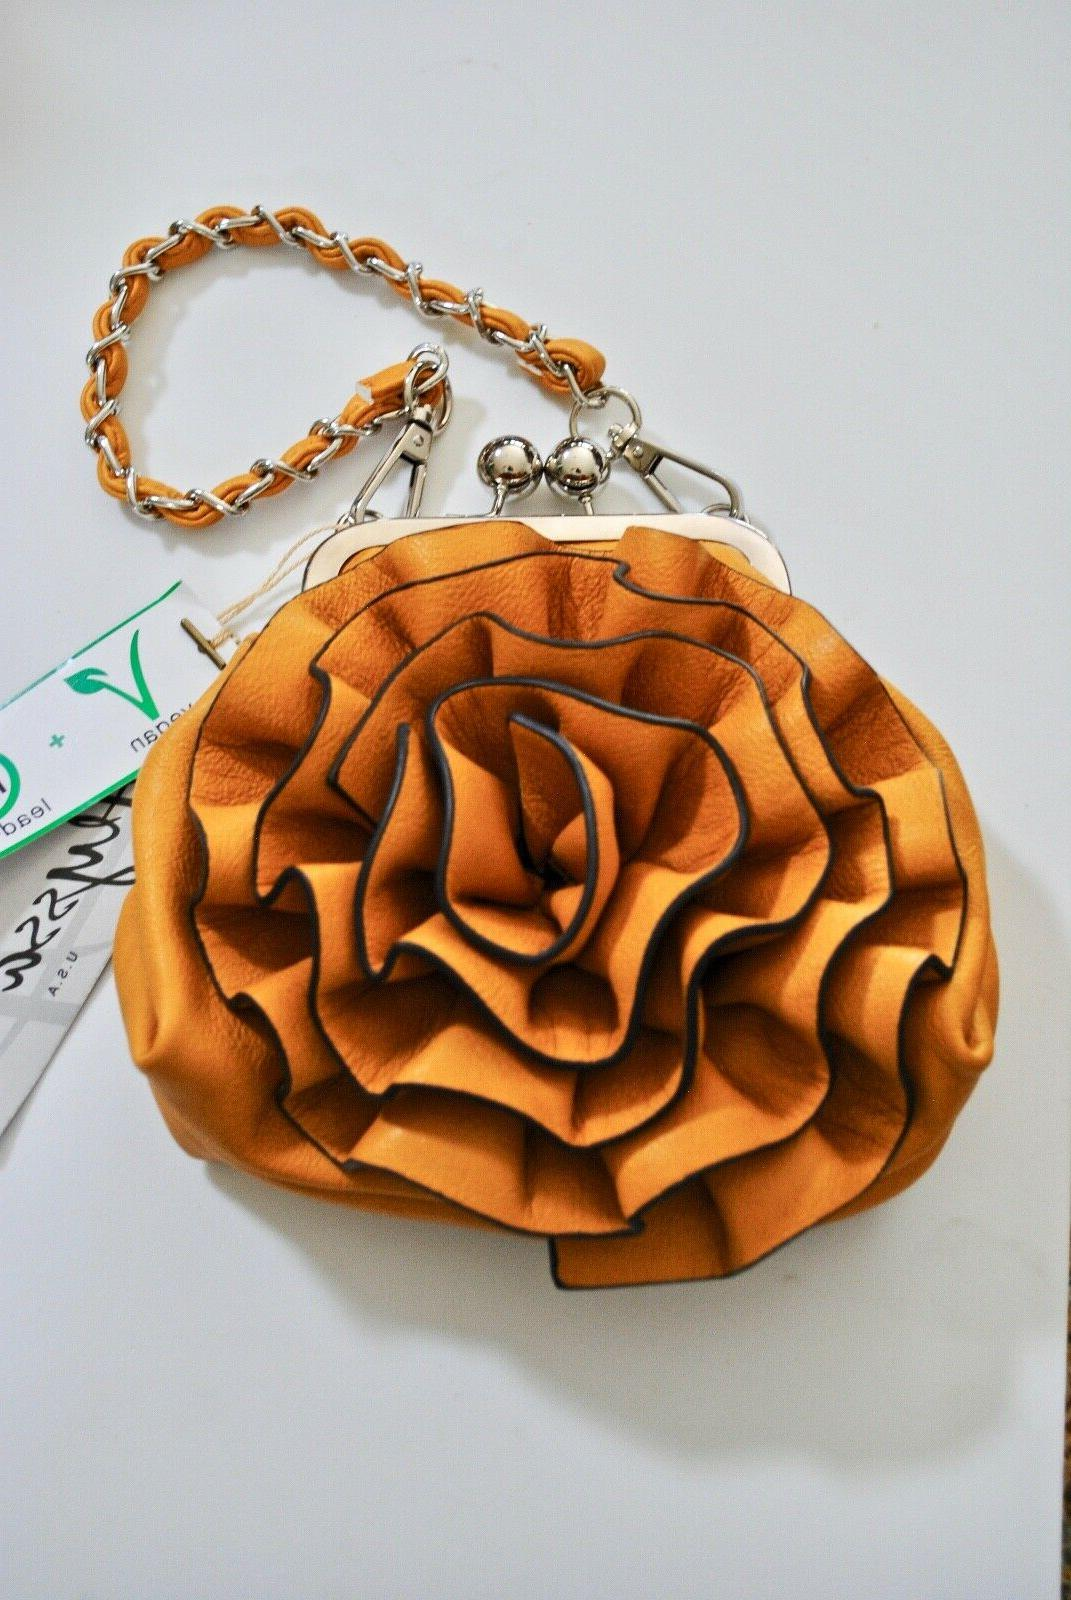 vegan faux leather pink purse handbag chain